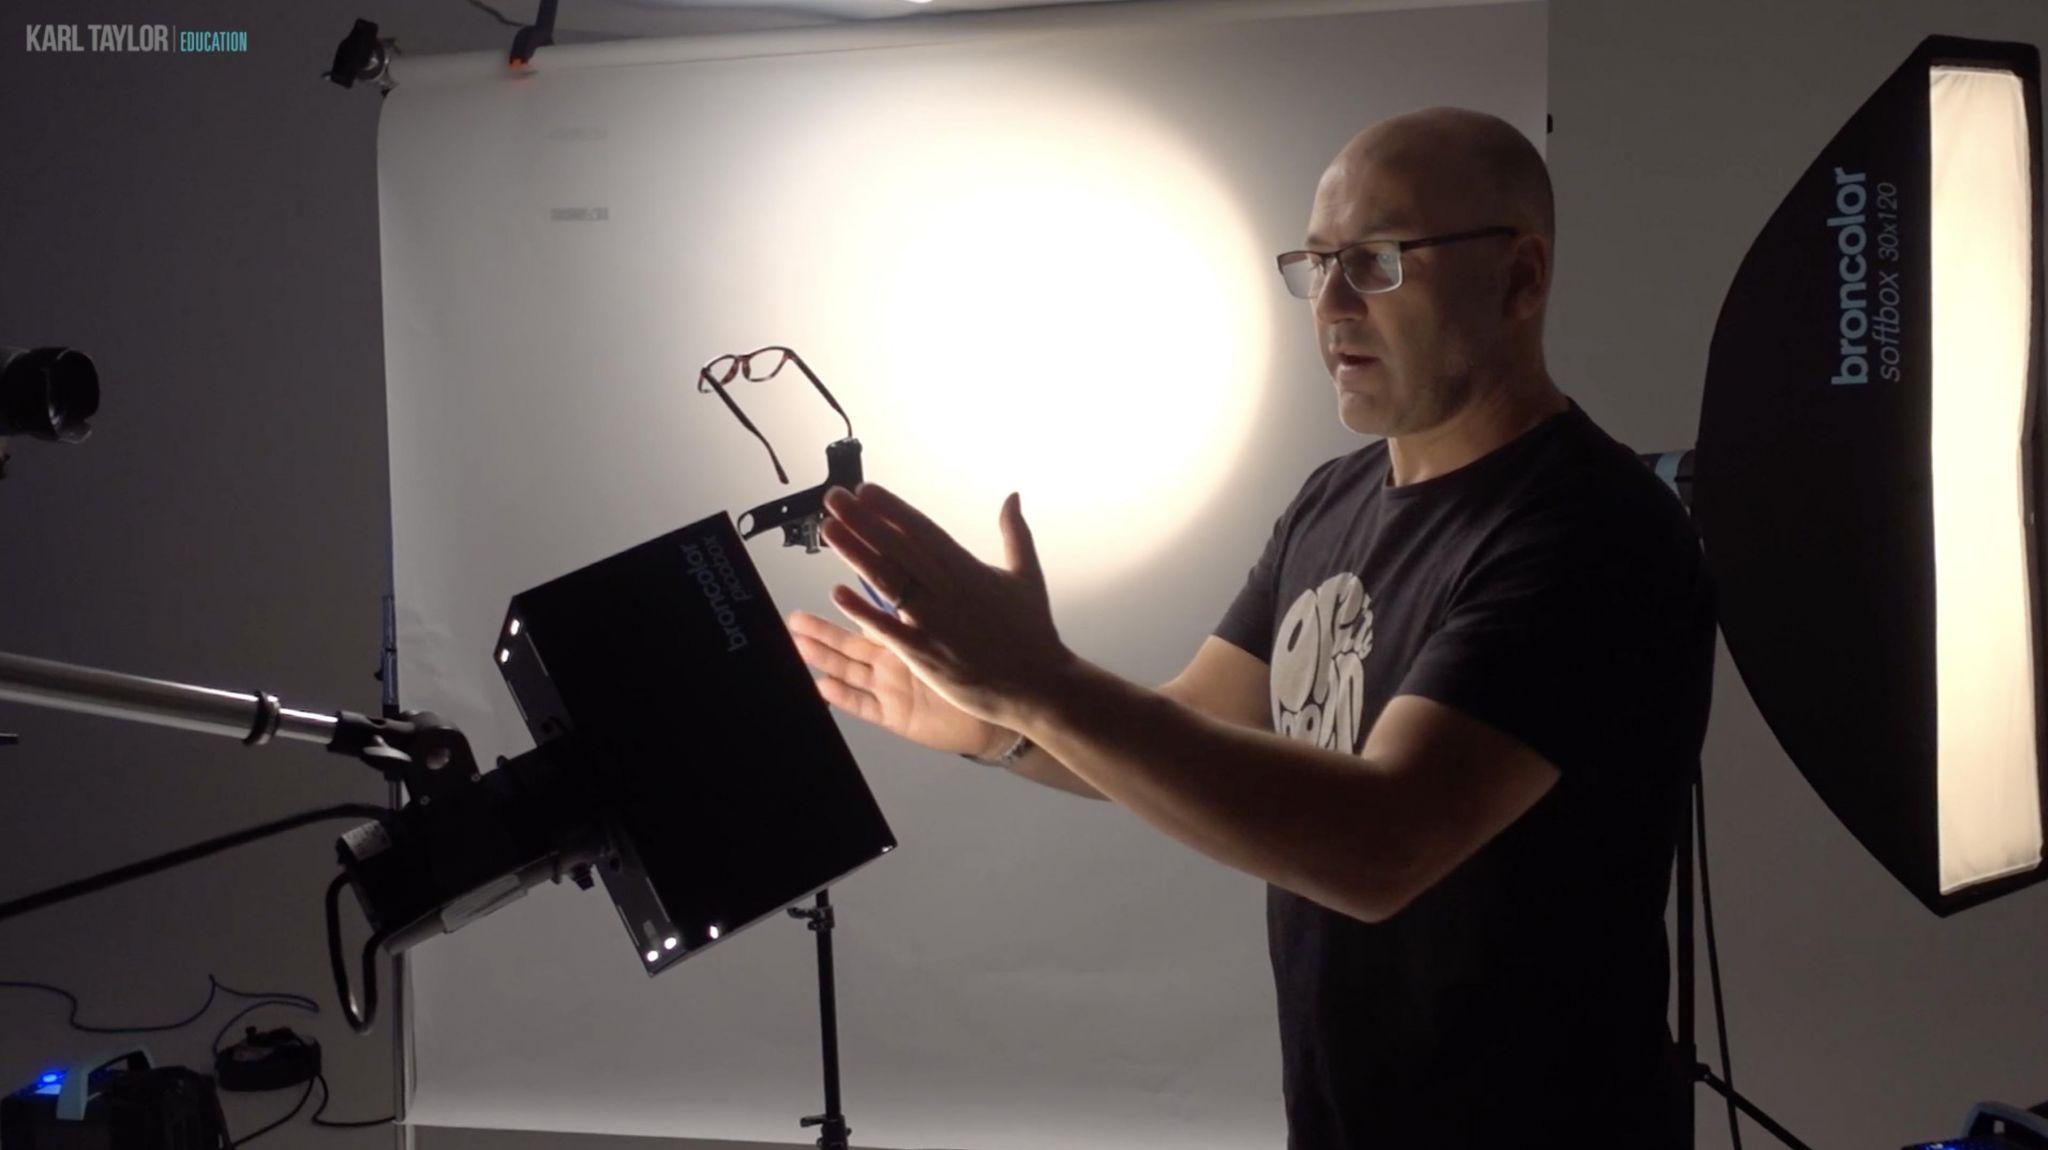 karl taylor photography tutorial